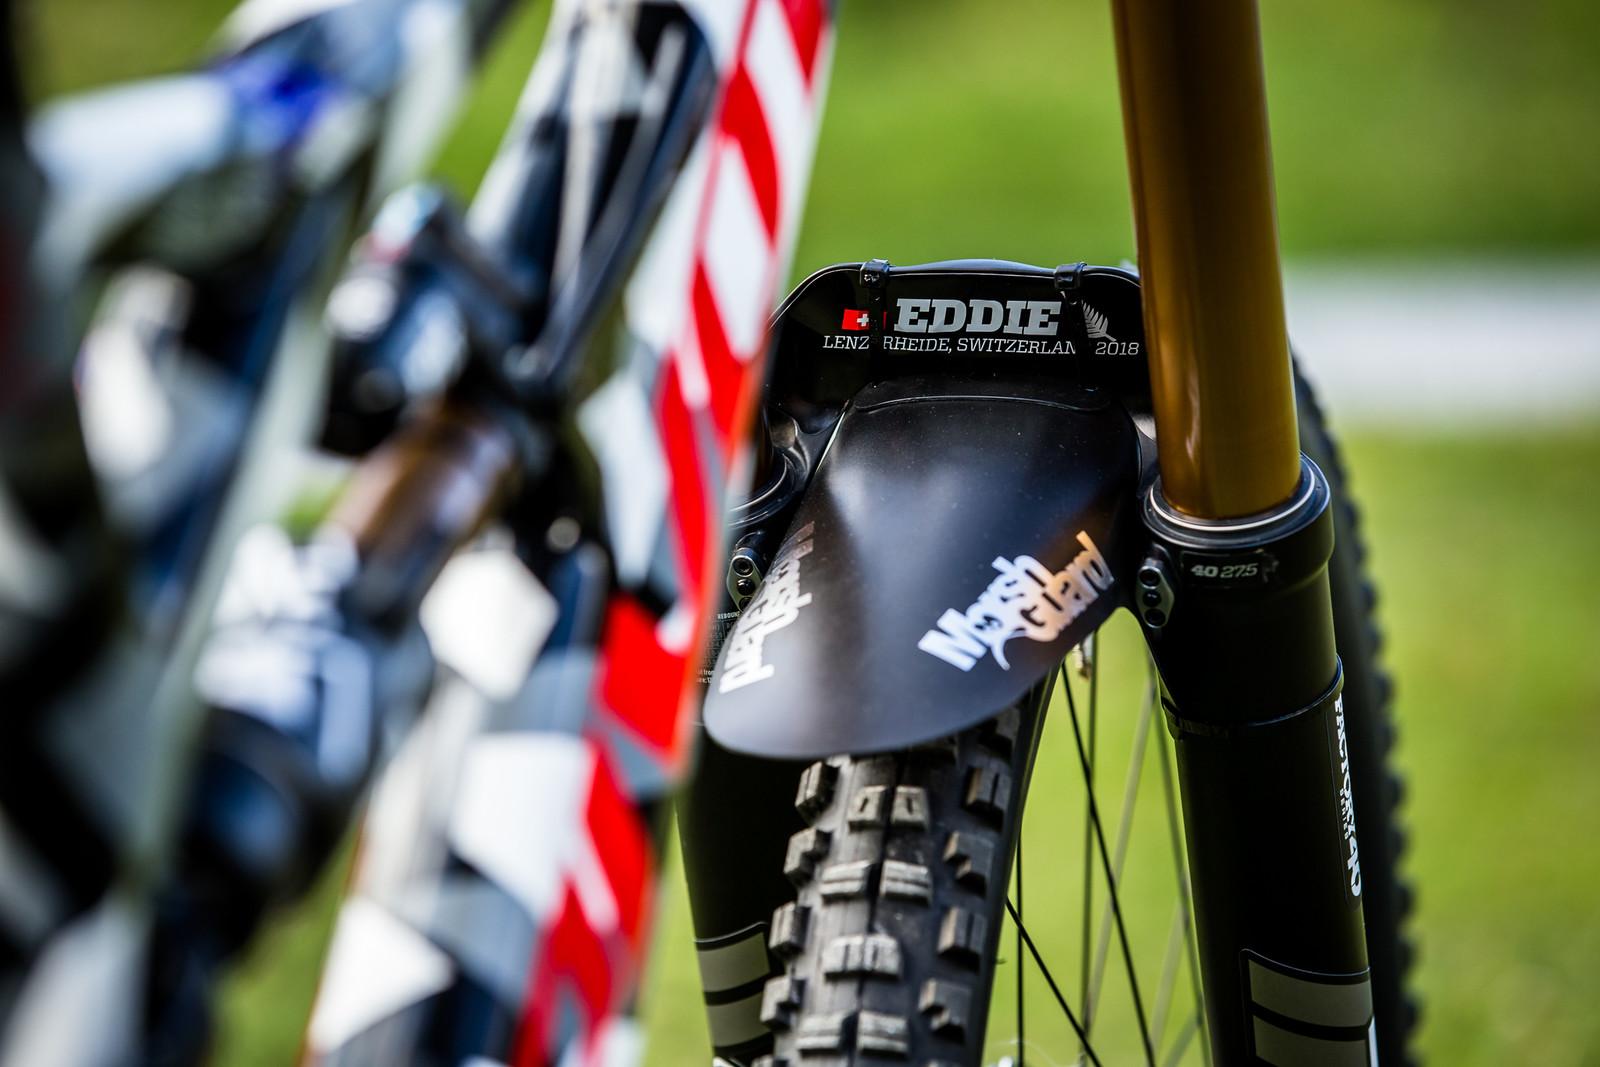 EDDIE - WORLD CHAMPS BIKE - Eddie Masters' Pivot Phoenix - Mountain Biking Pictures - Vital MTB